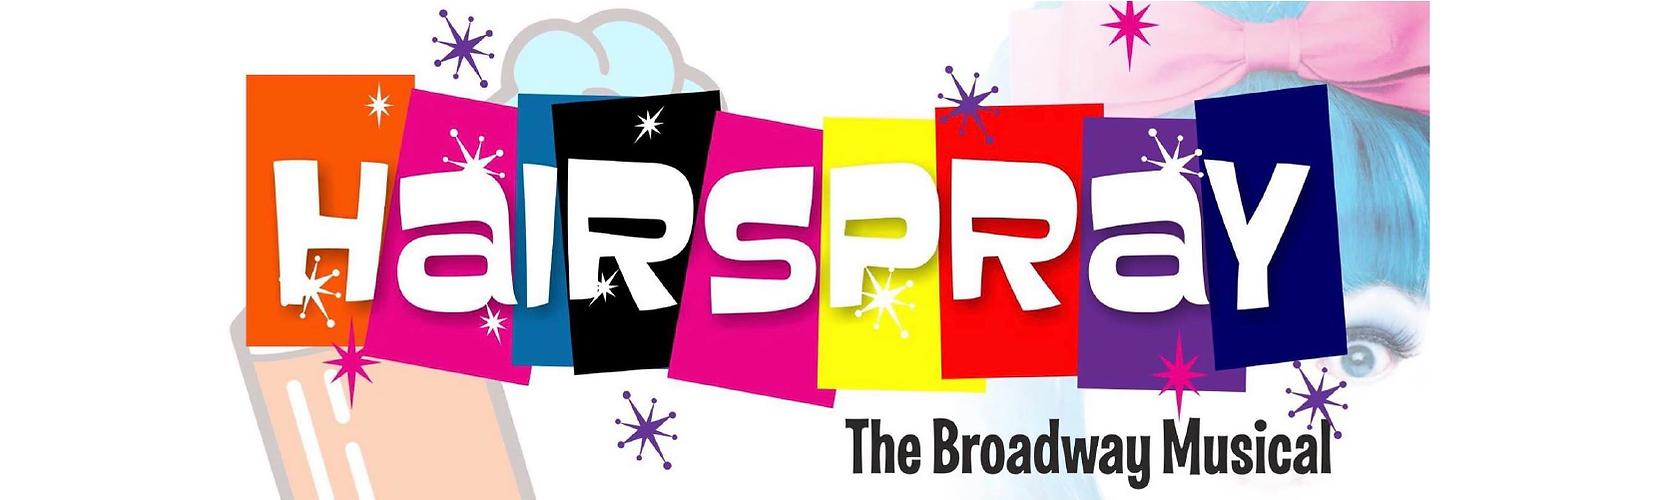 Web-Show-Header-Hairspray.png